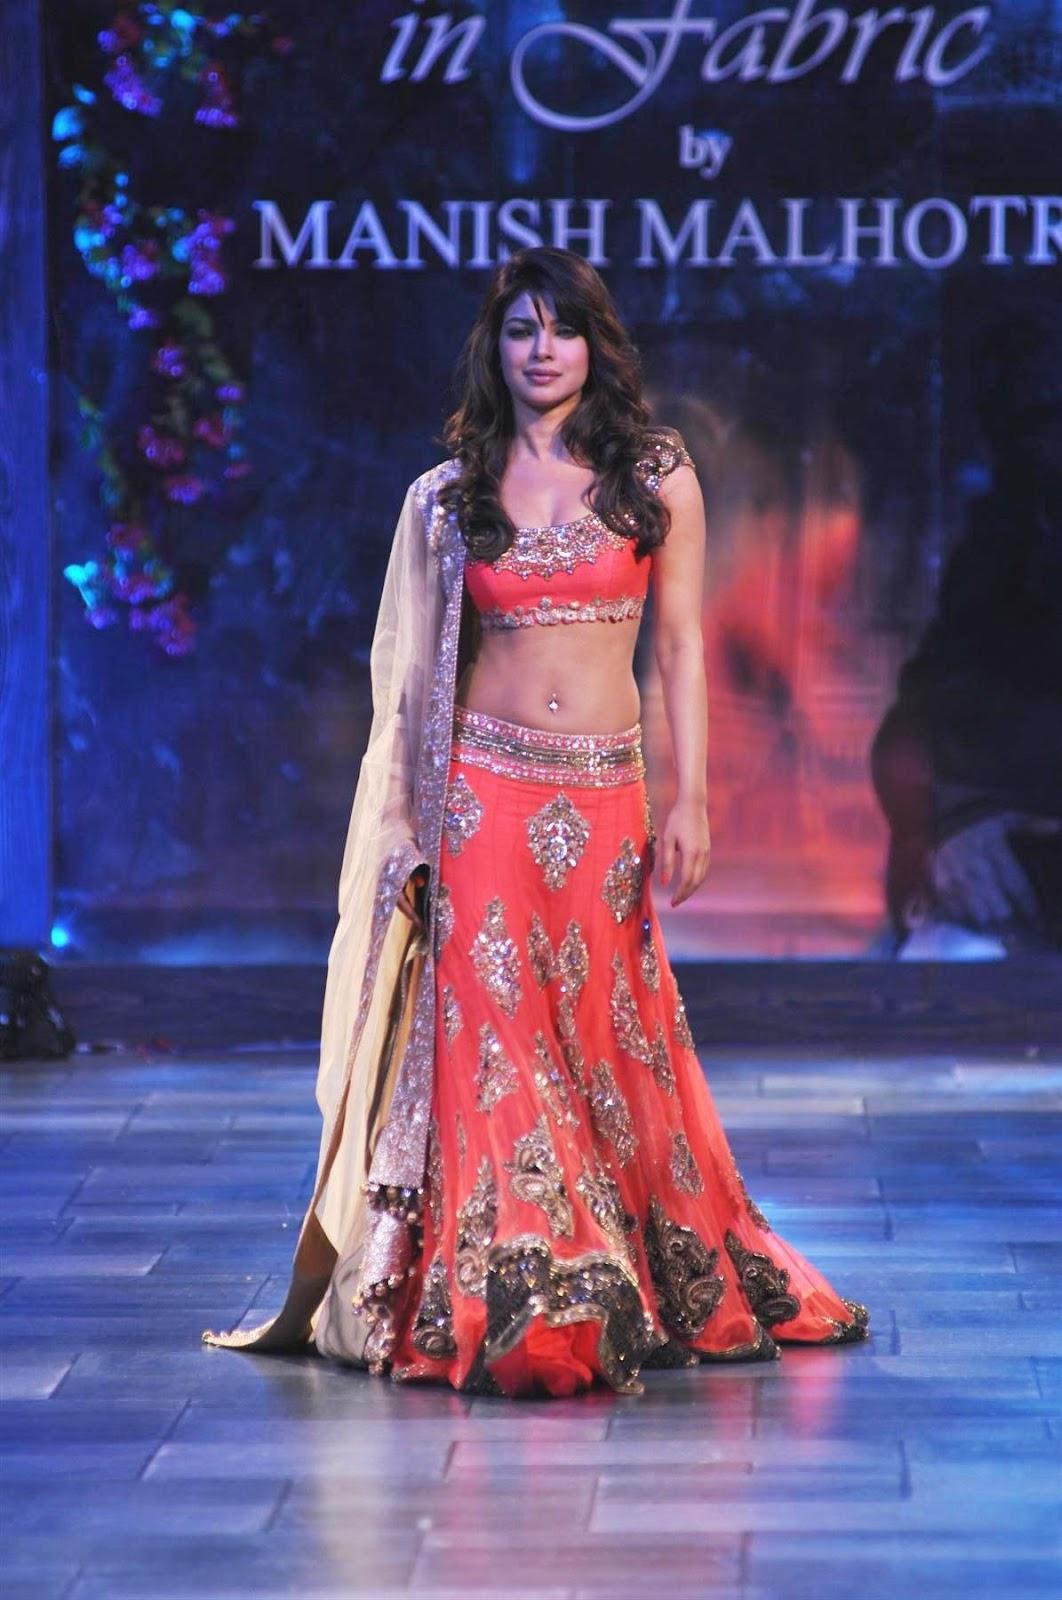 Priyanka Chopra Hot In Manish Malhotra Saree Show In Mumbai